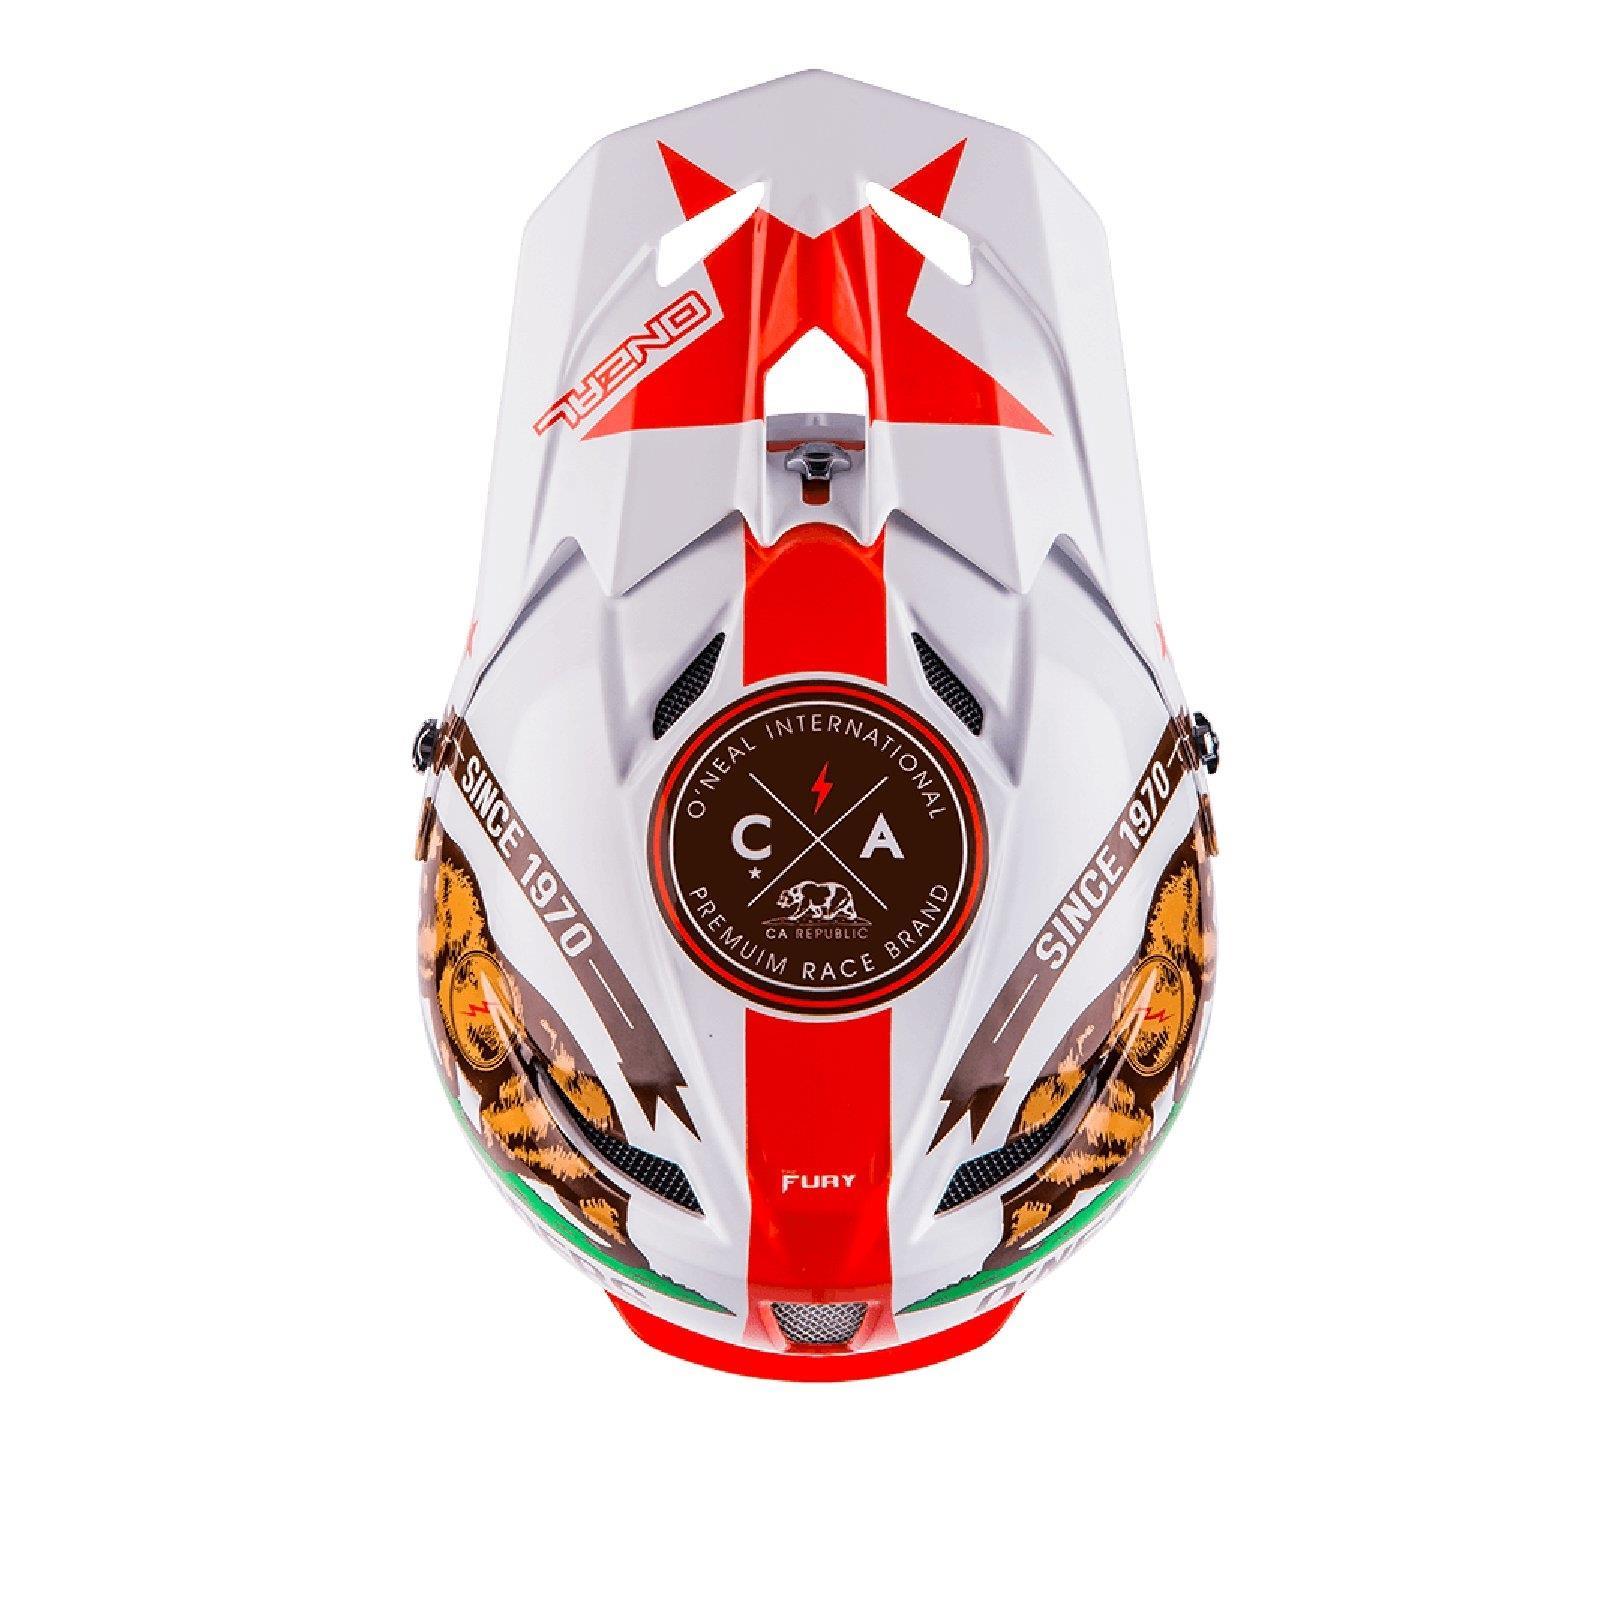 Oneal-Fury-RL-Casque-California-Fullface-alpin-DH-FR-MTB-GoPro-VTT-FMX